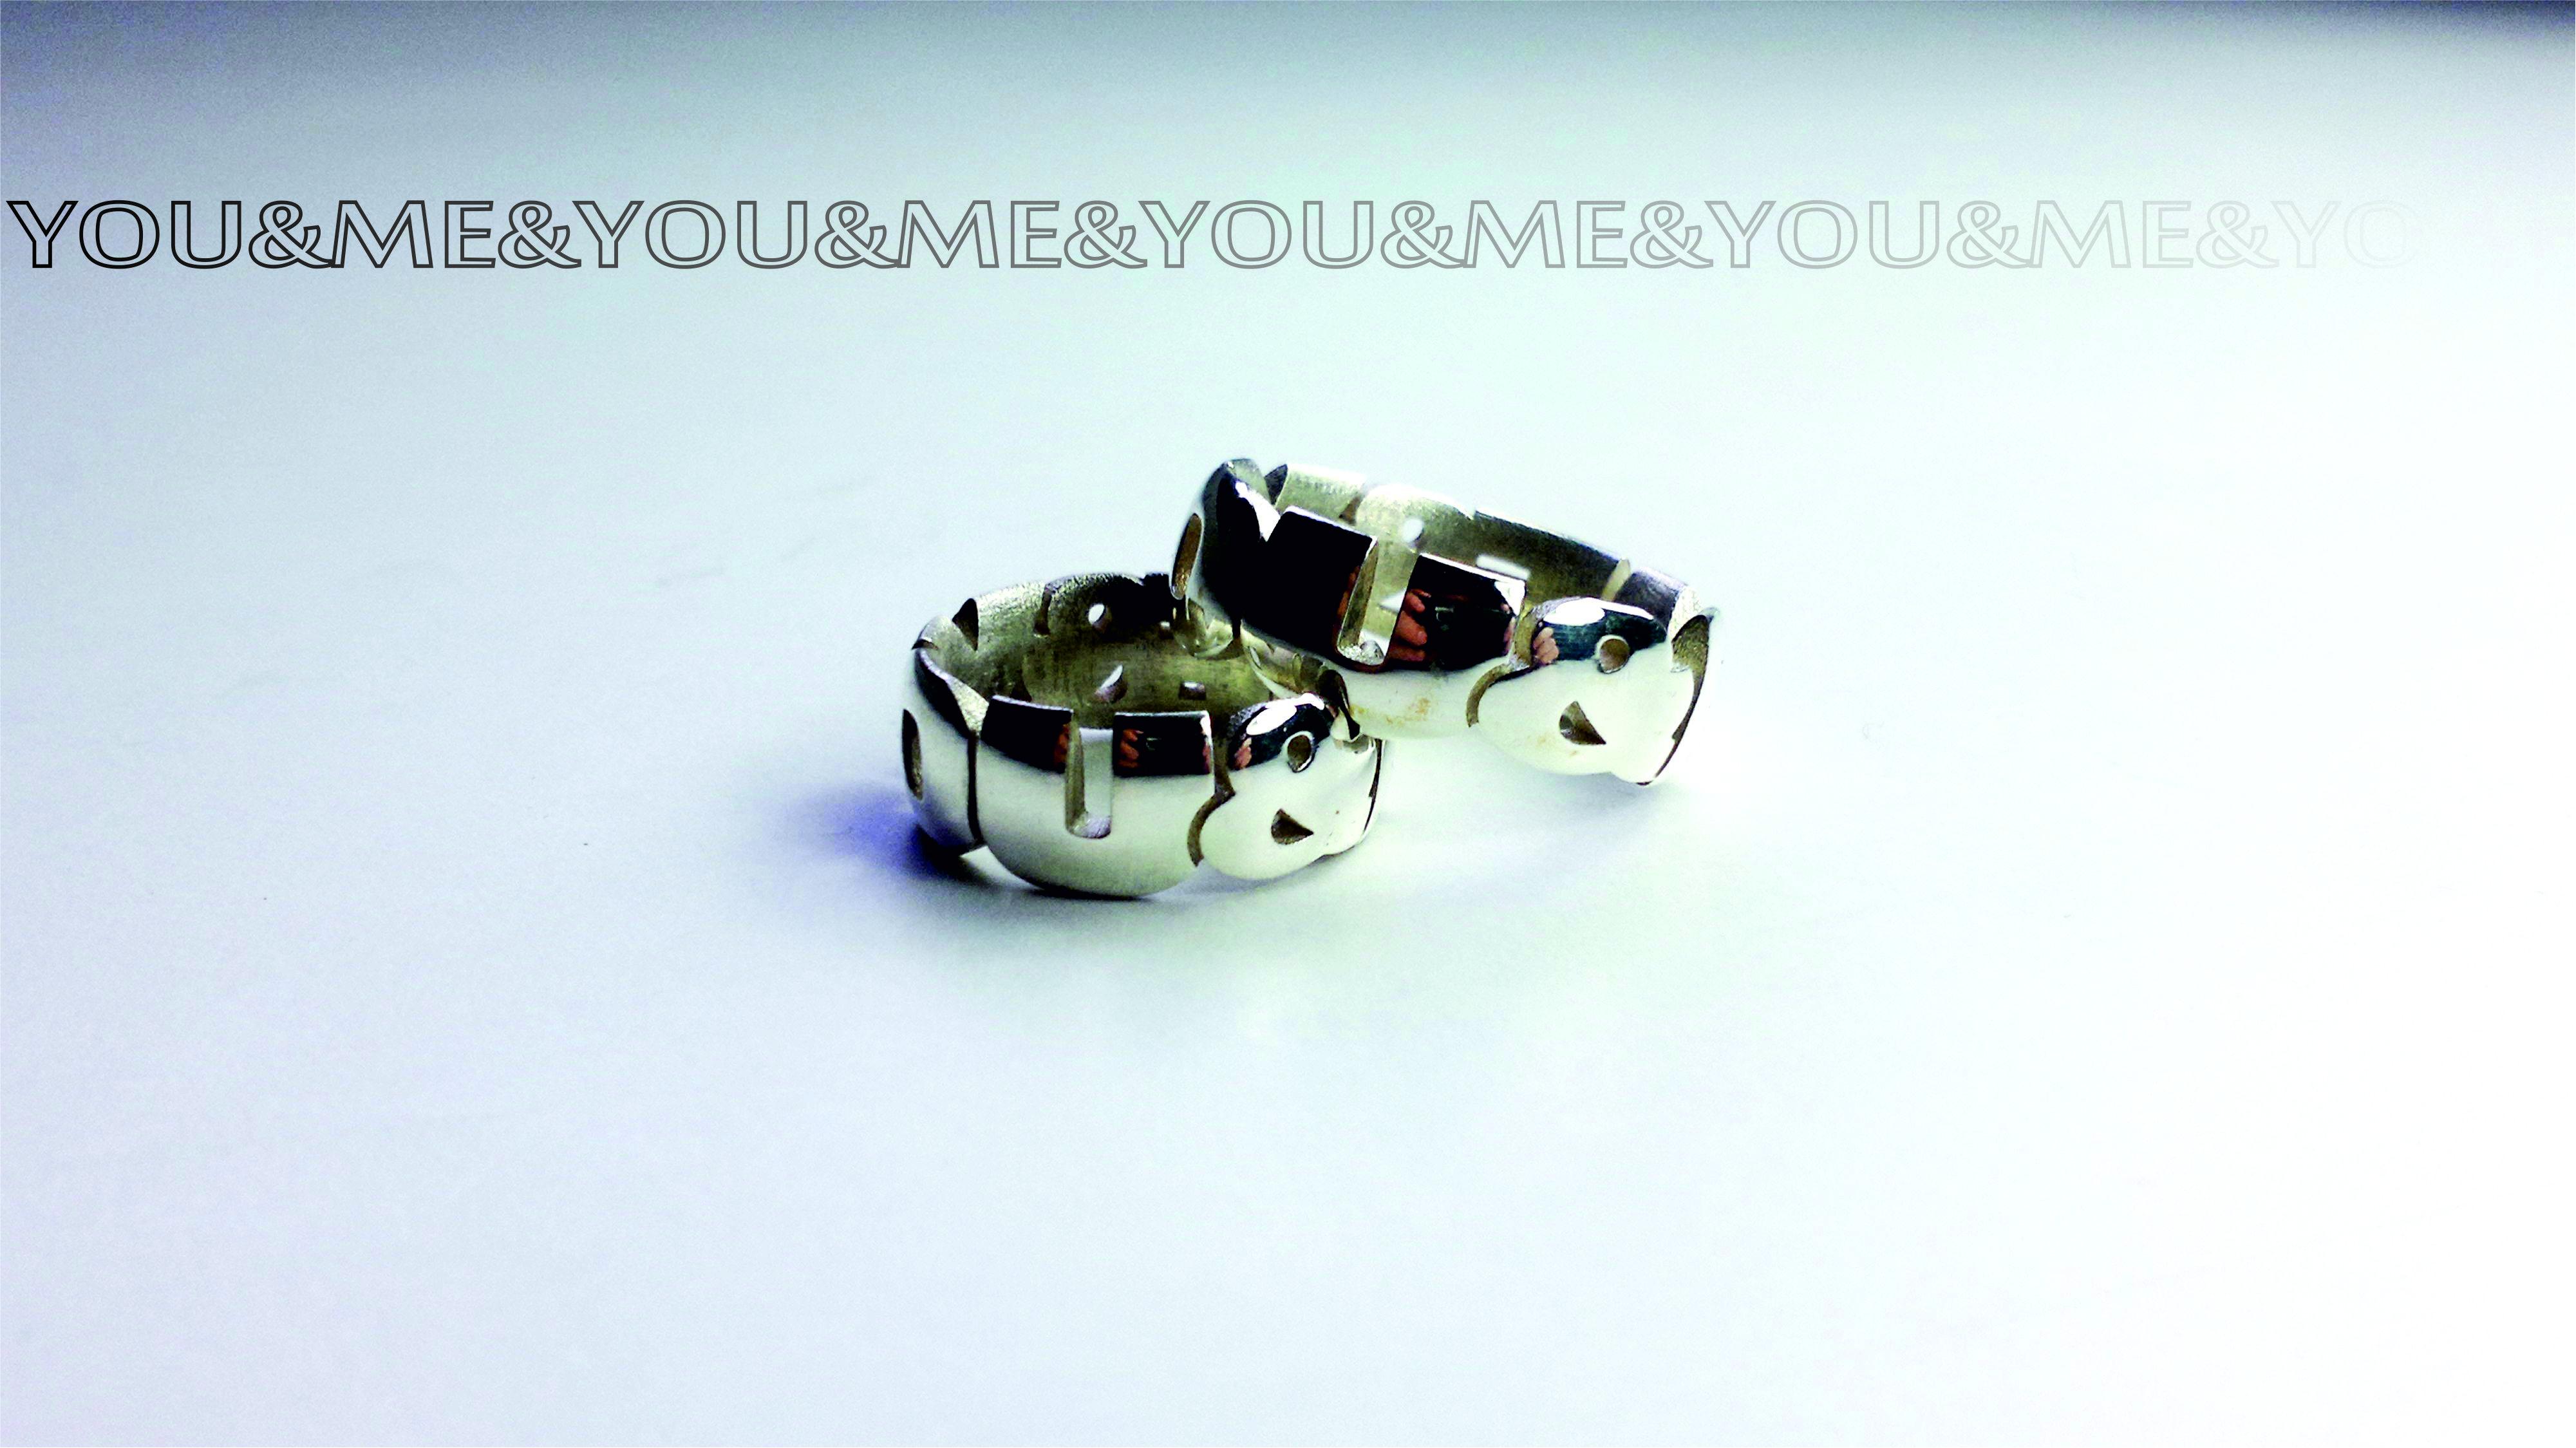 YOU&ME 1.jpg